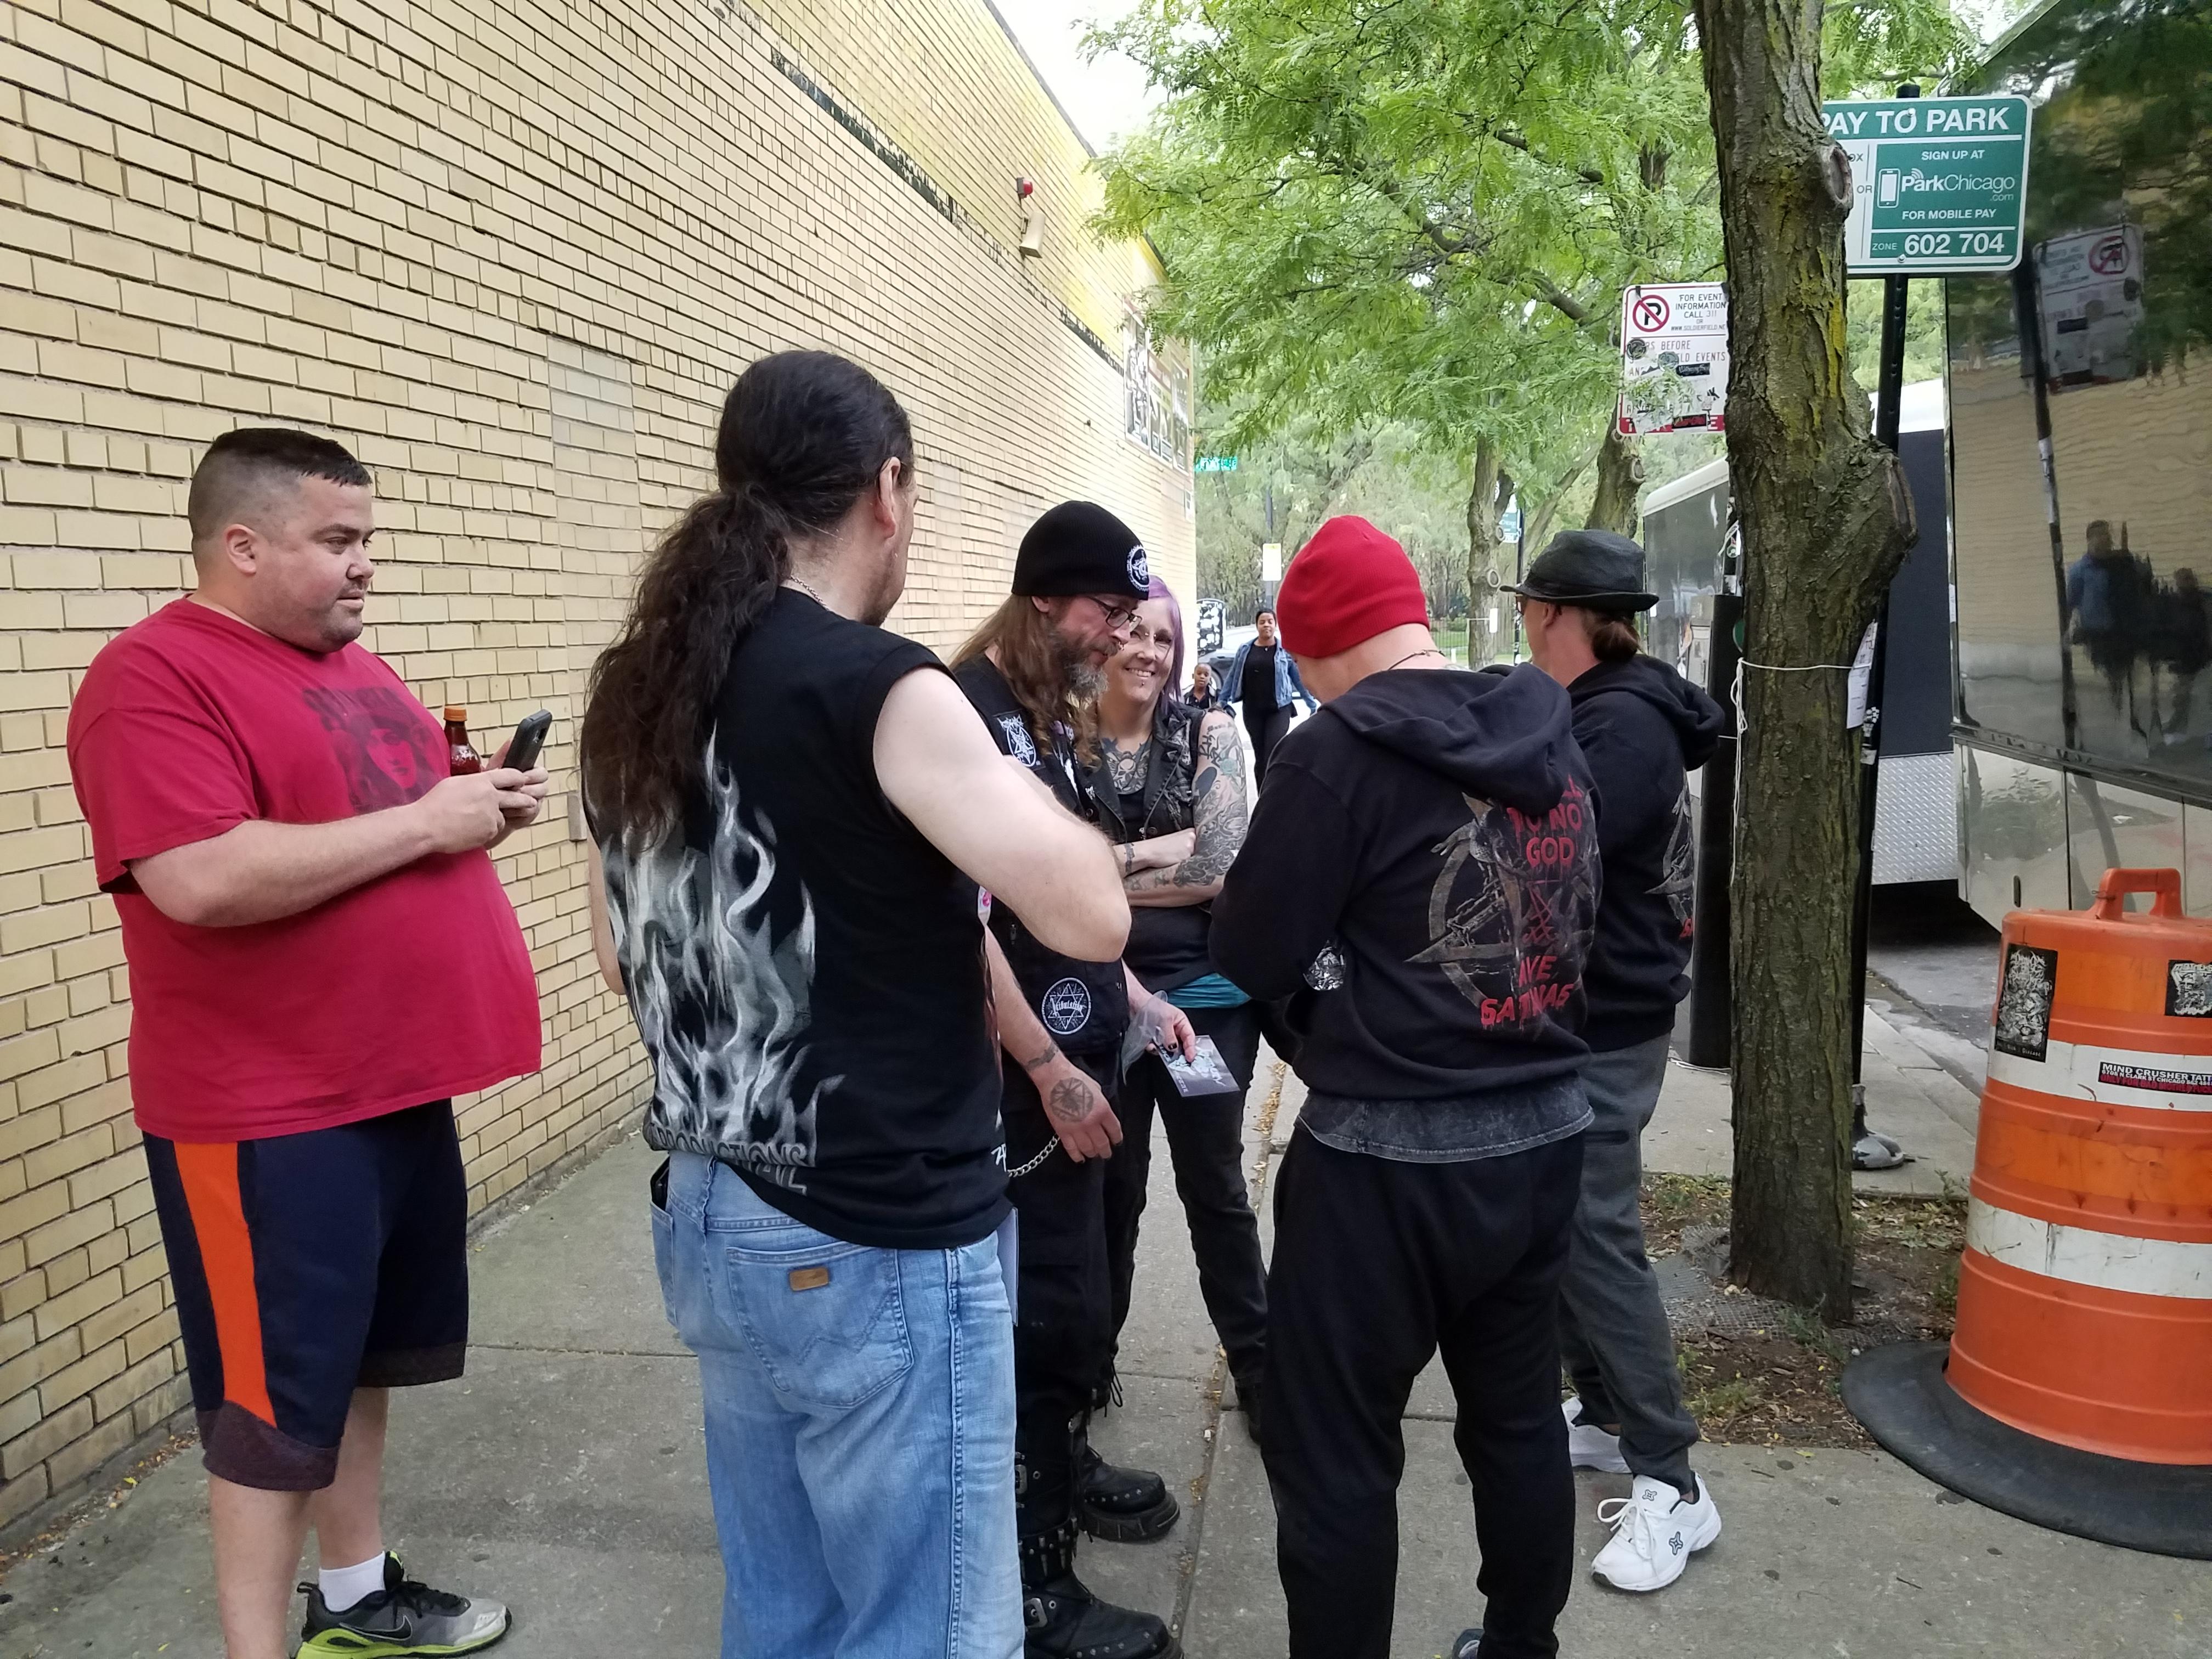 Venom, Inc. Fans at Chicago's Reggies (September 8, 2017, credit Melanie Falina)